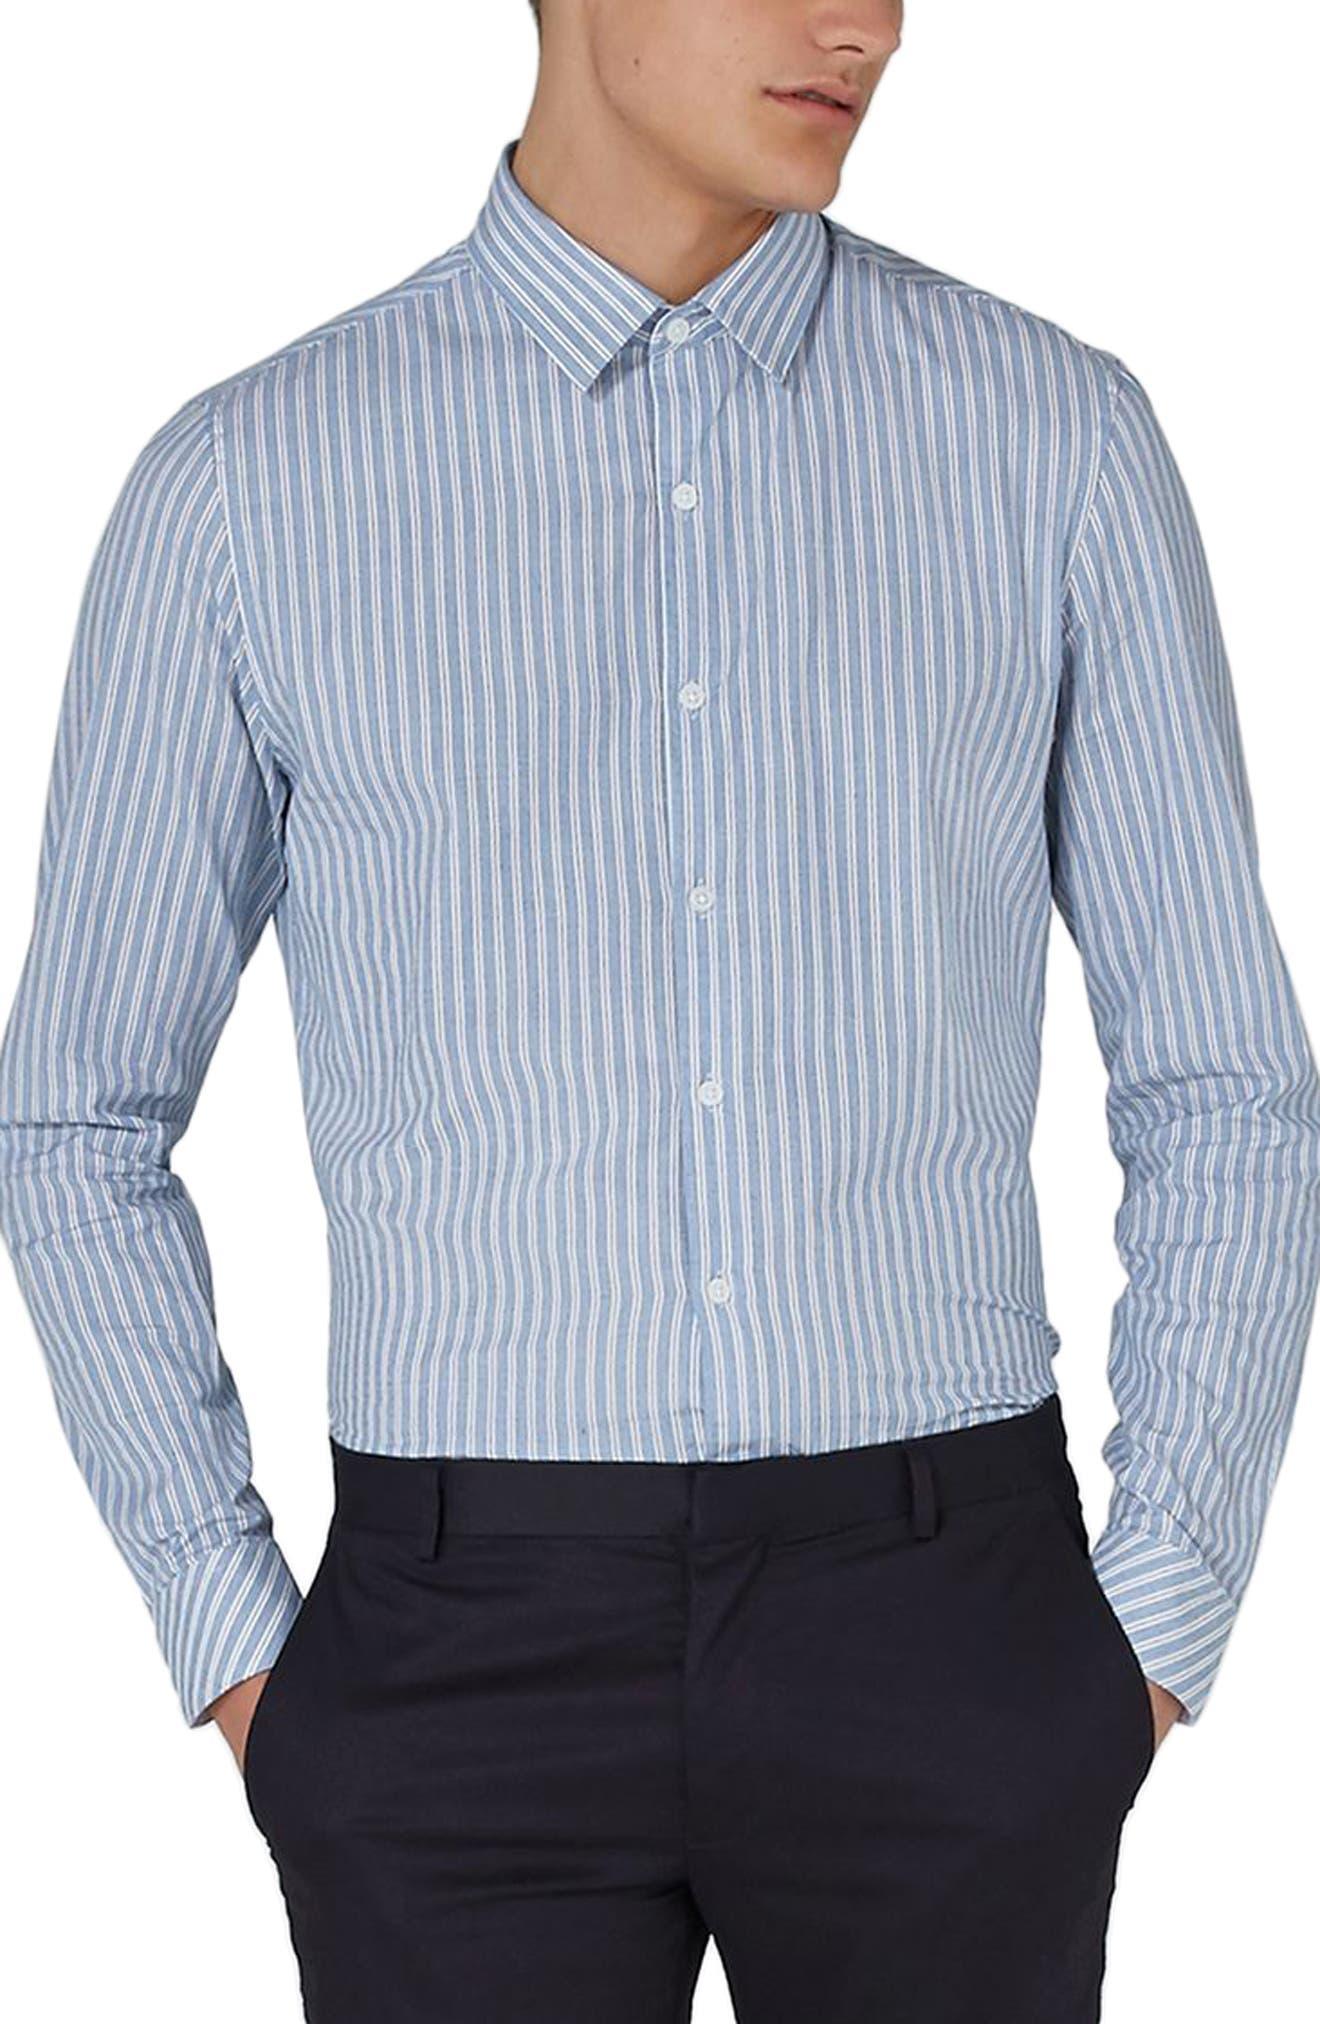 Classic Fit Stripe Smart Shirt,                             Main thumbnail 1, color,                             Blue Multi